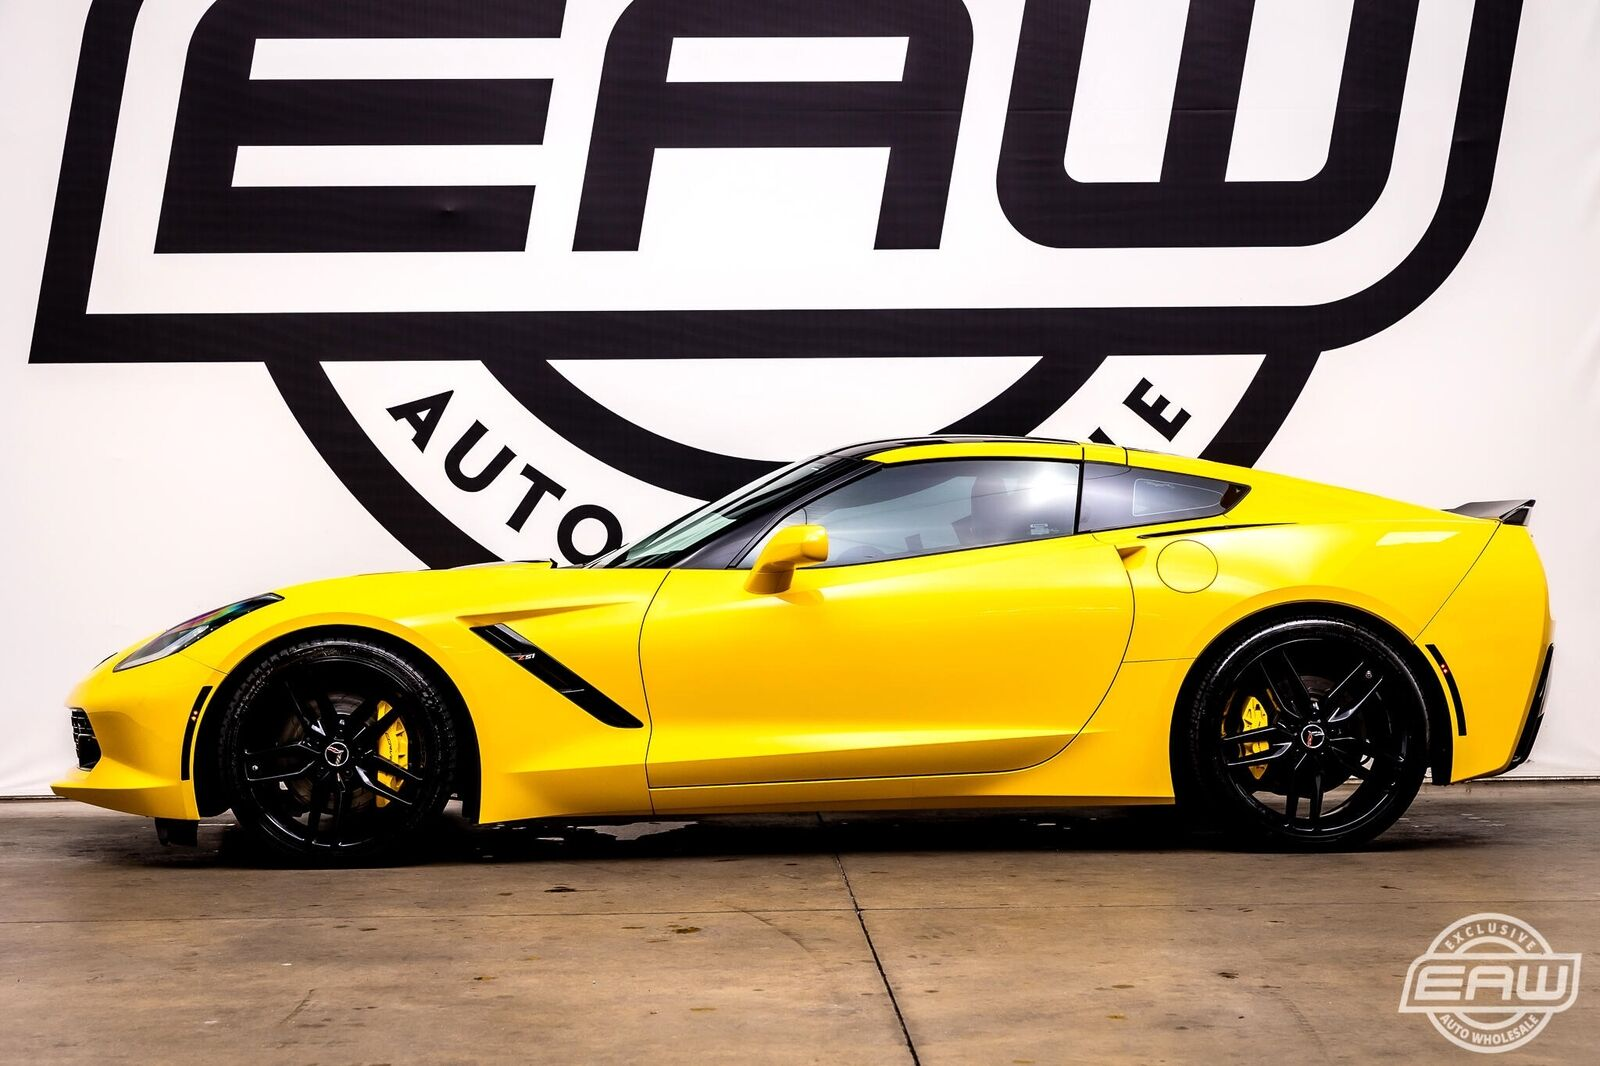 2014 Yellow Chevrolet Corvette Coupe 2LT   C7 Corvette Photo 6